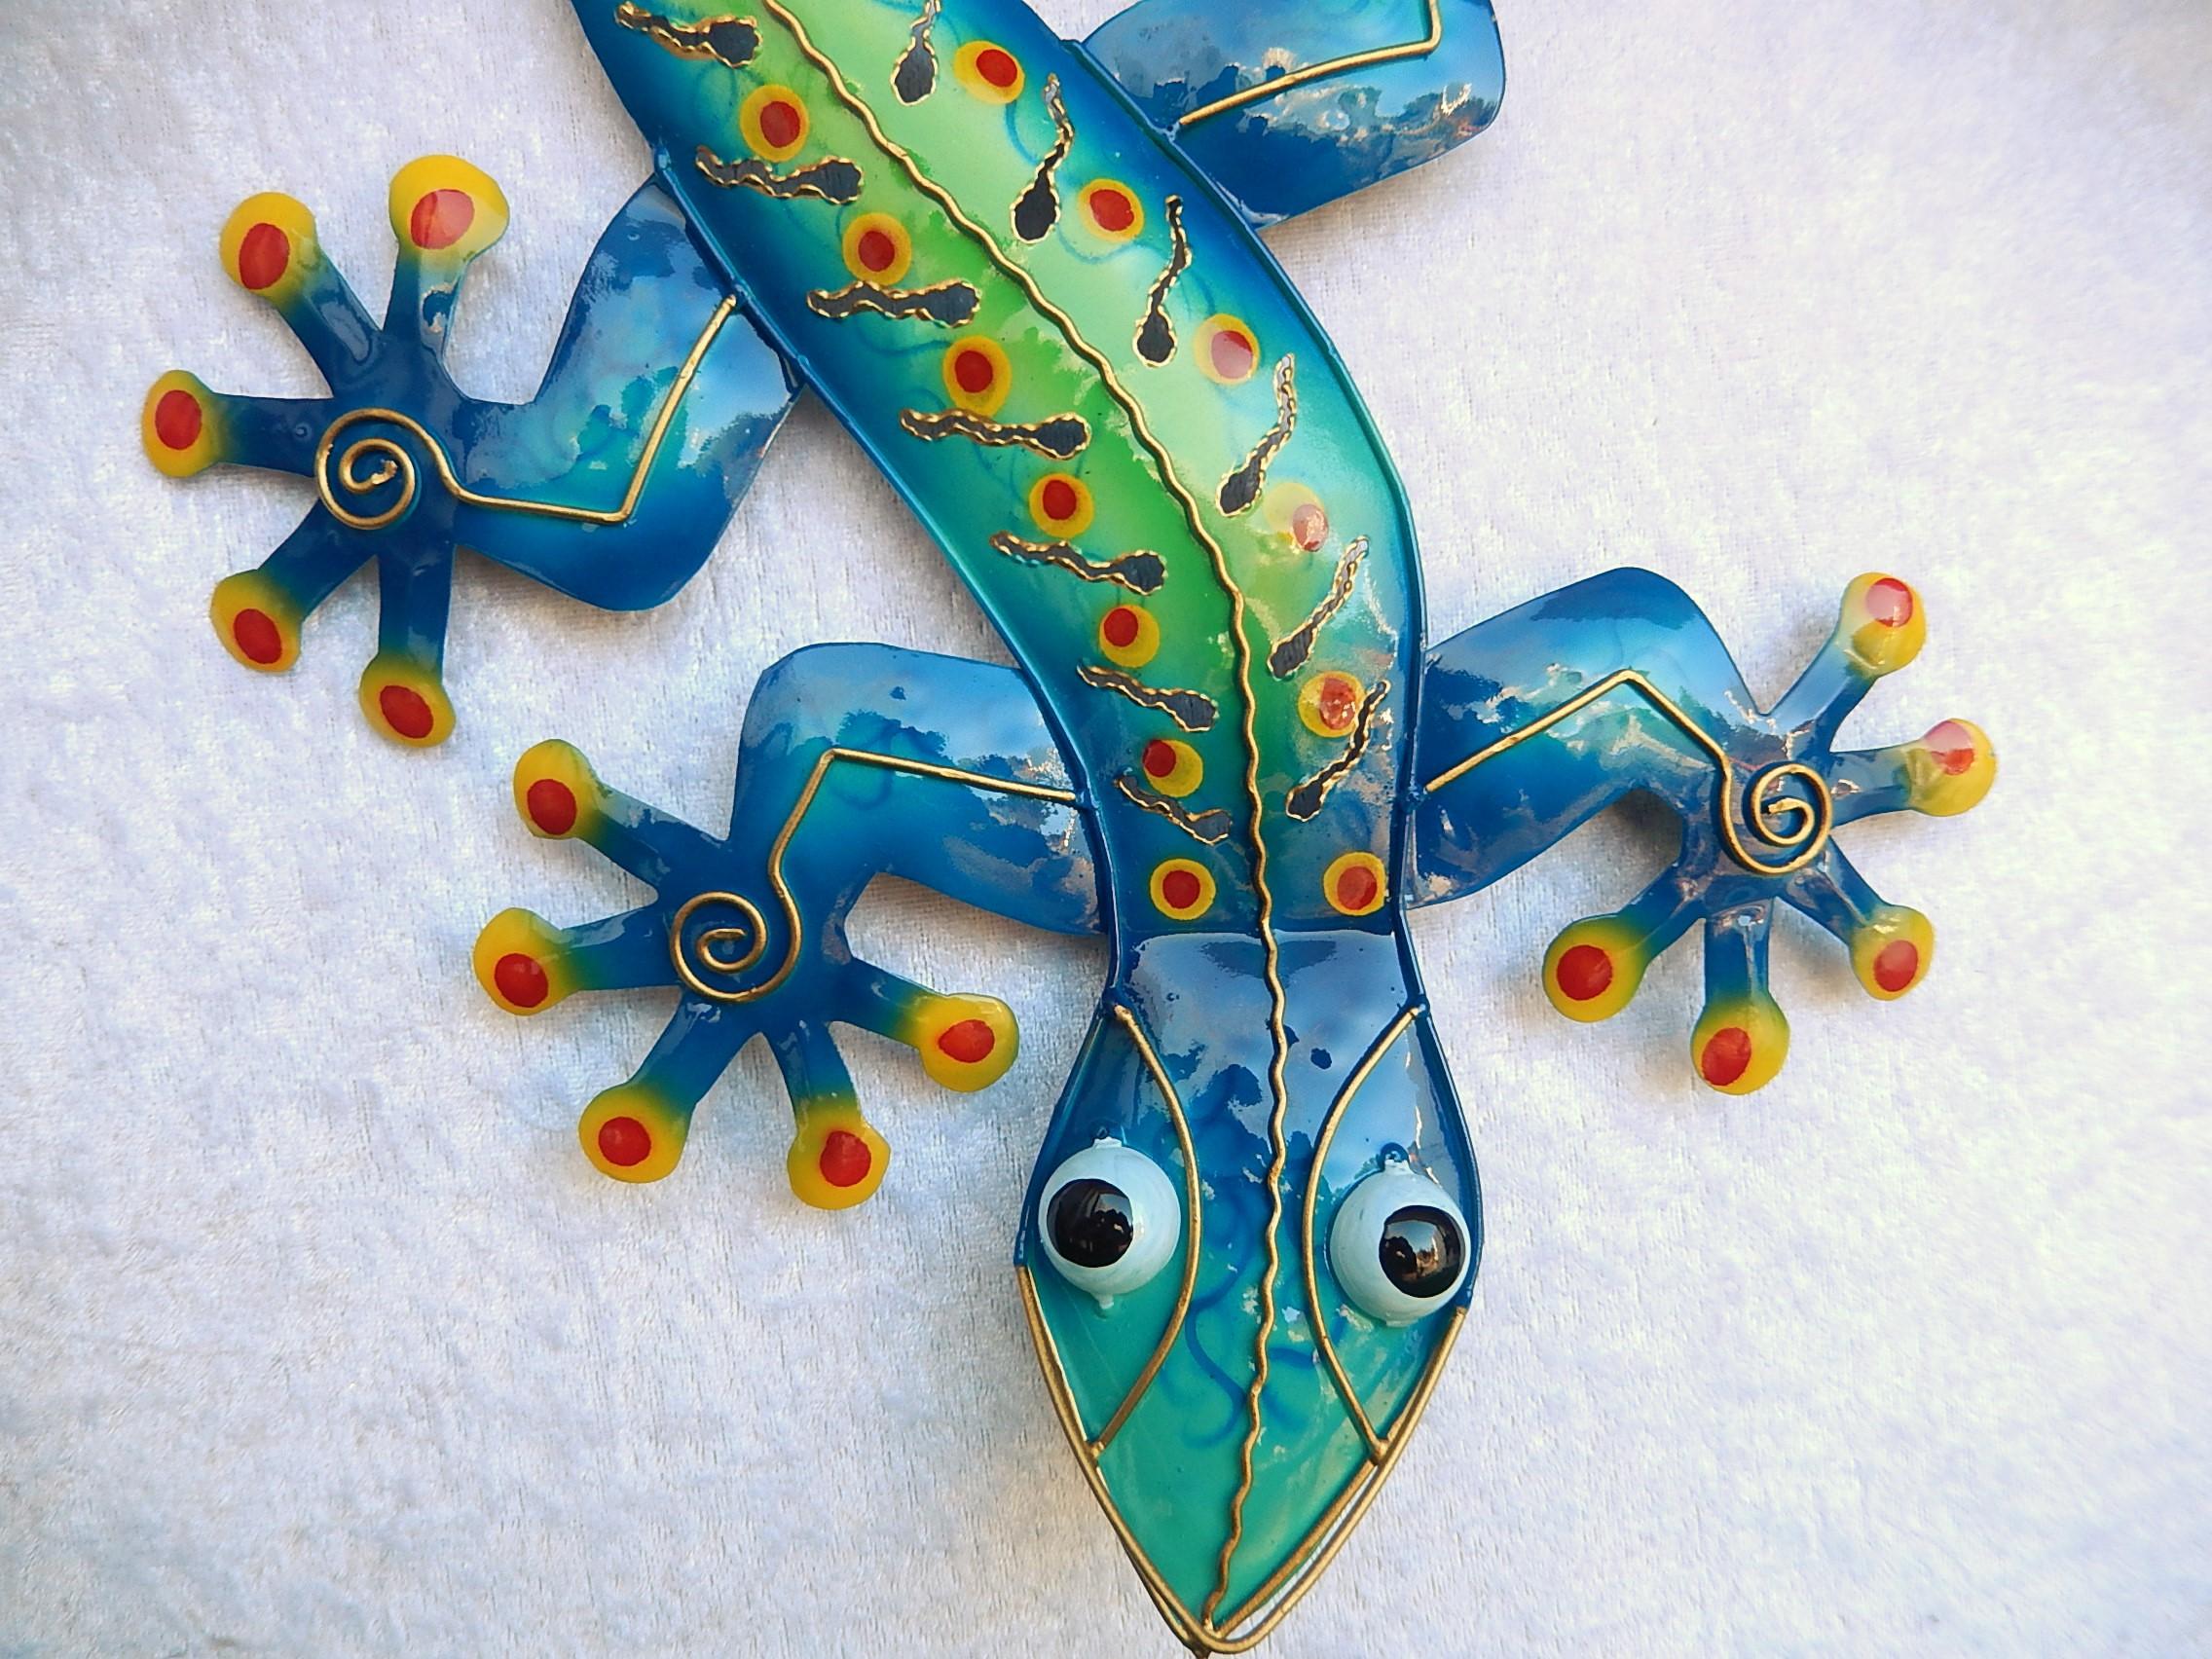 Gecko Eidechse Salamander Echse Wanddeko Metall Gartendeko Blechfigur Geko bunt